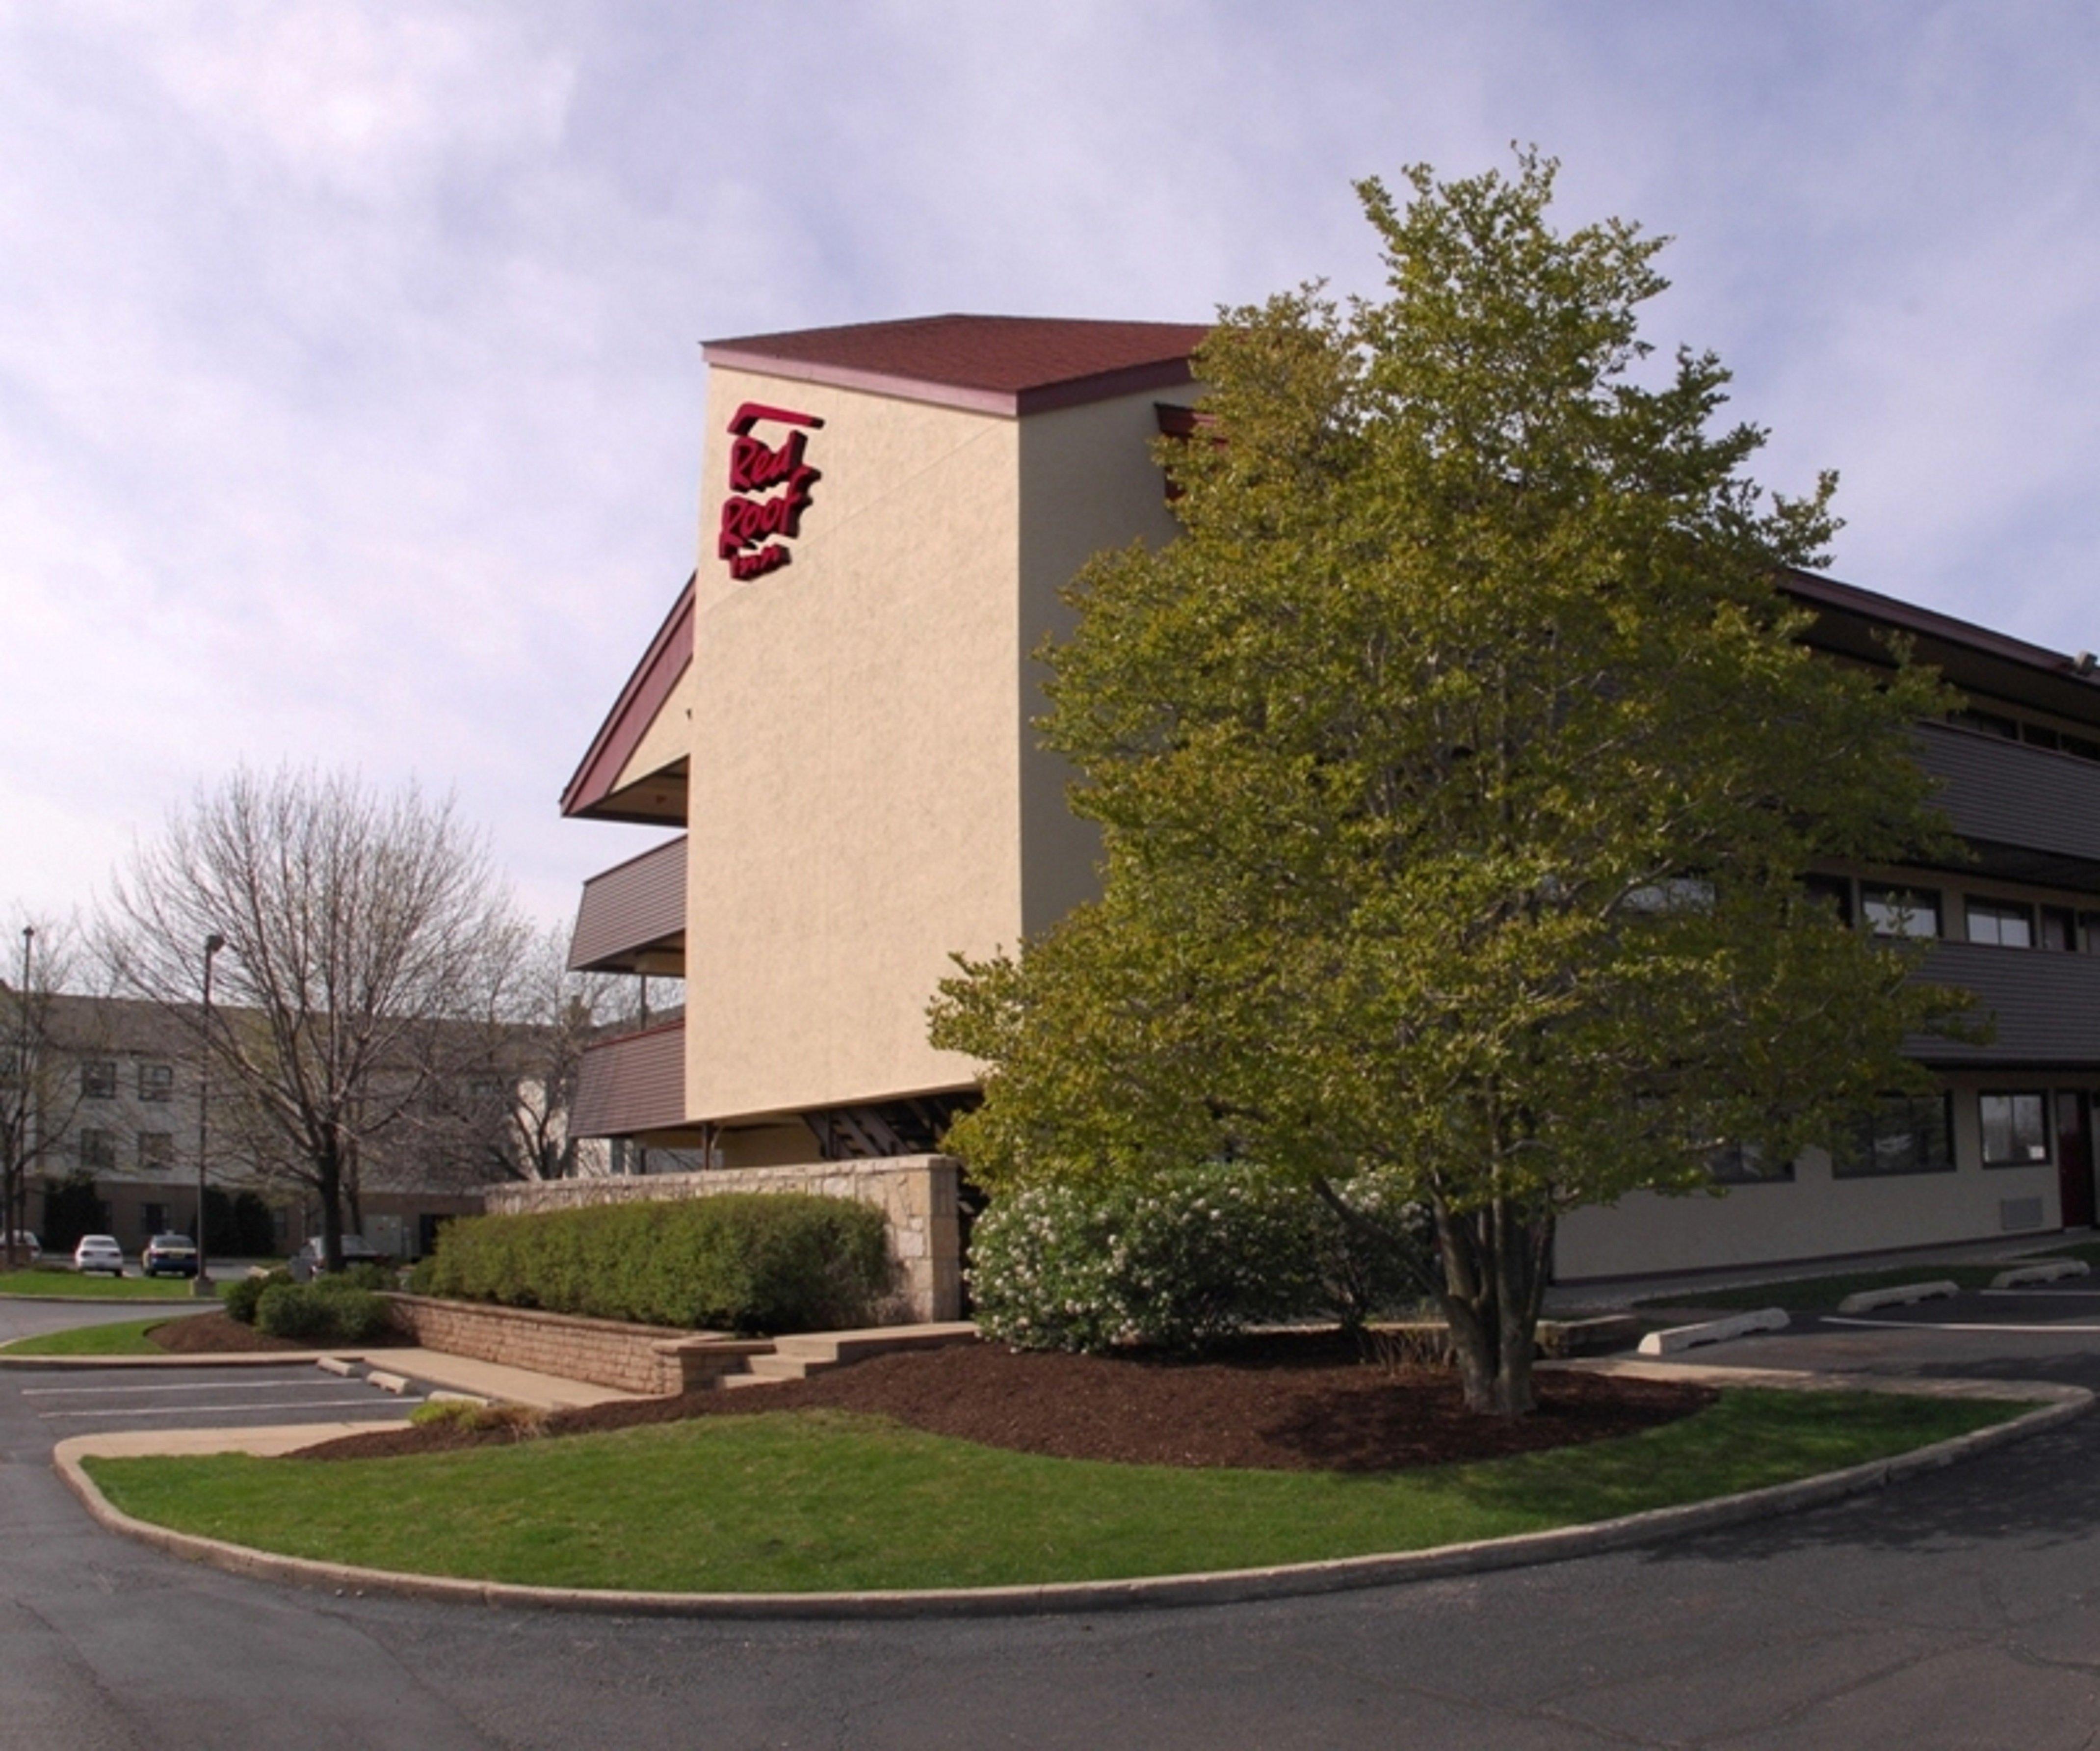 Red Roof Inn Wilkes-Barre, Luzerne